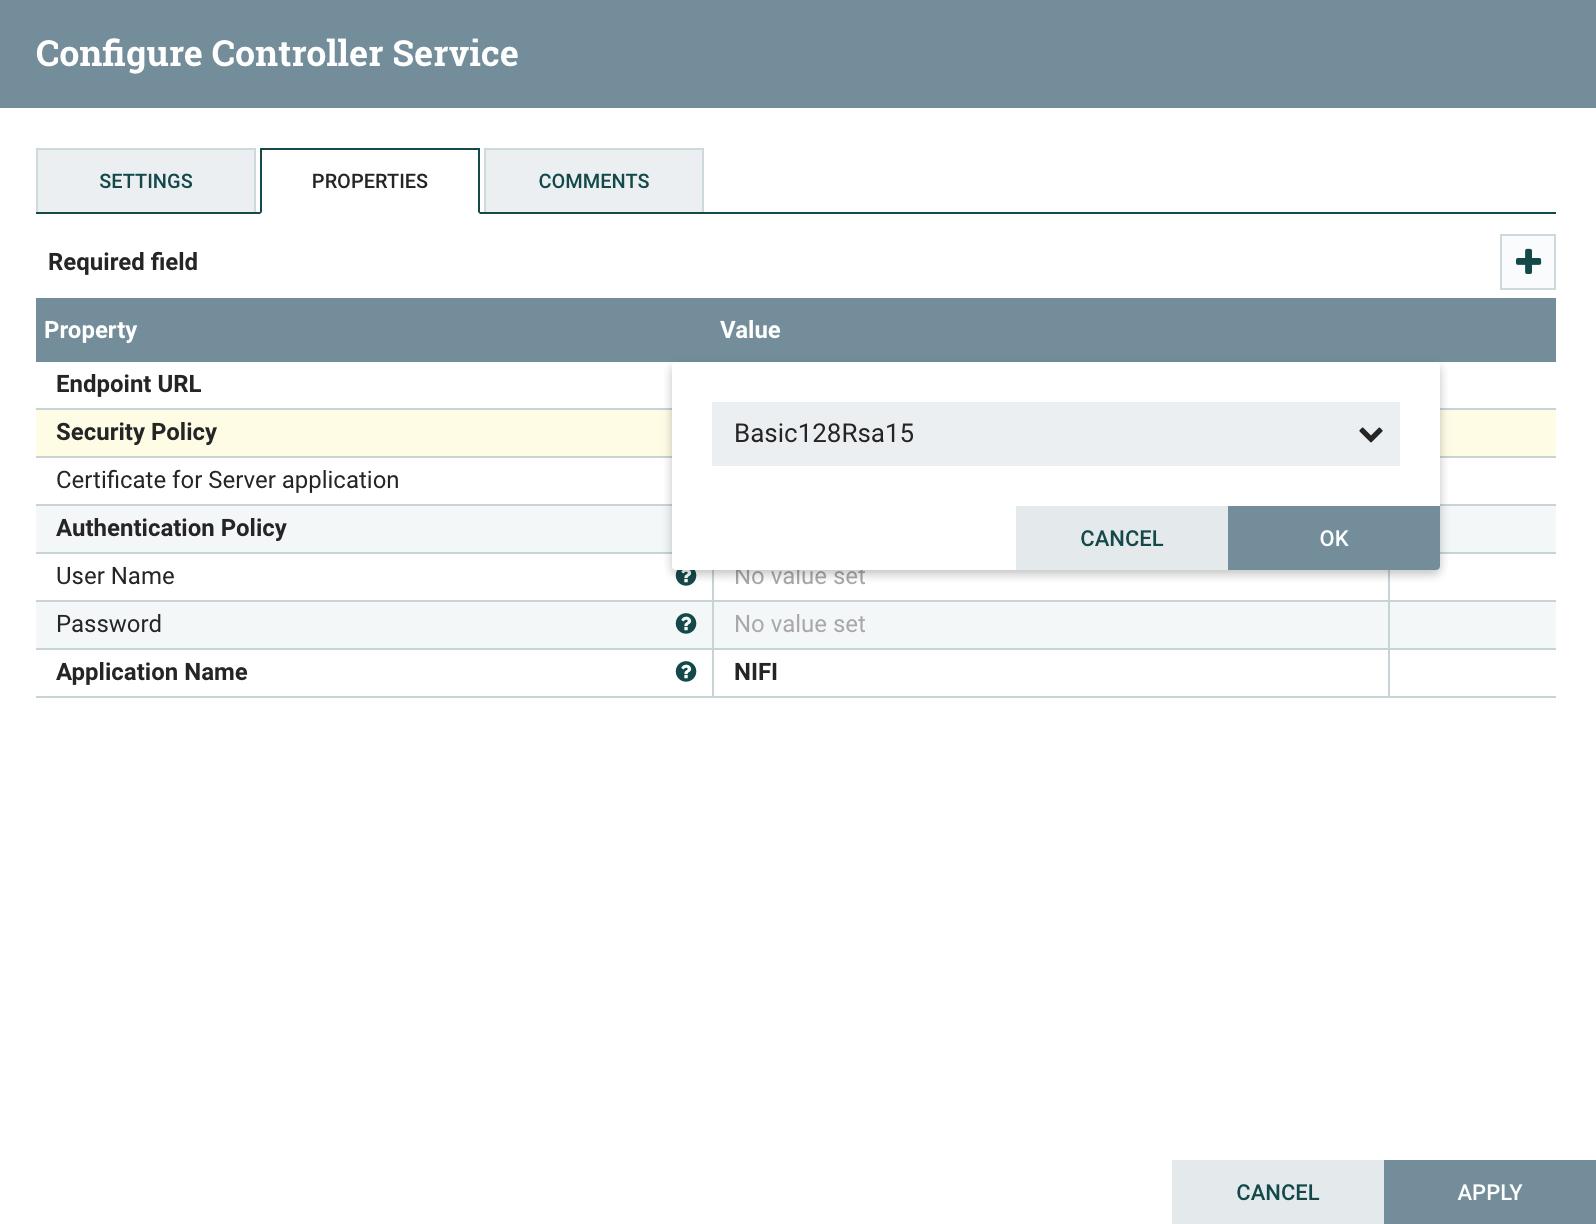 Configure controller service